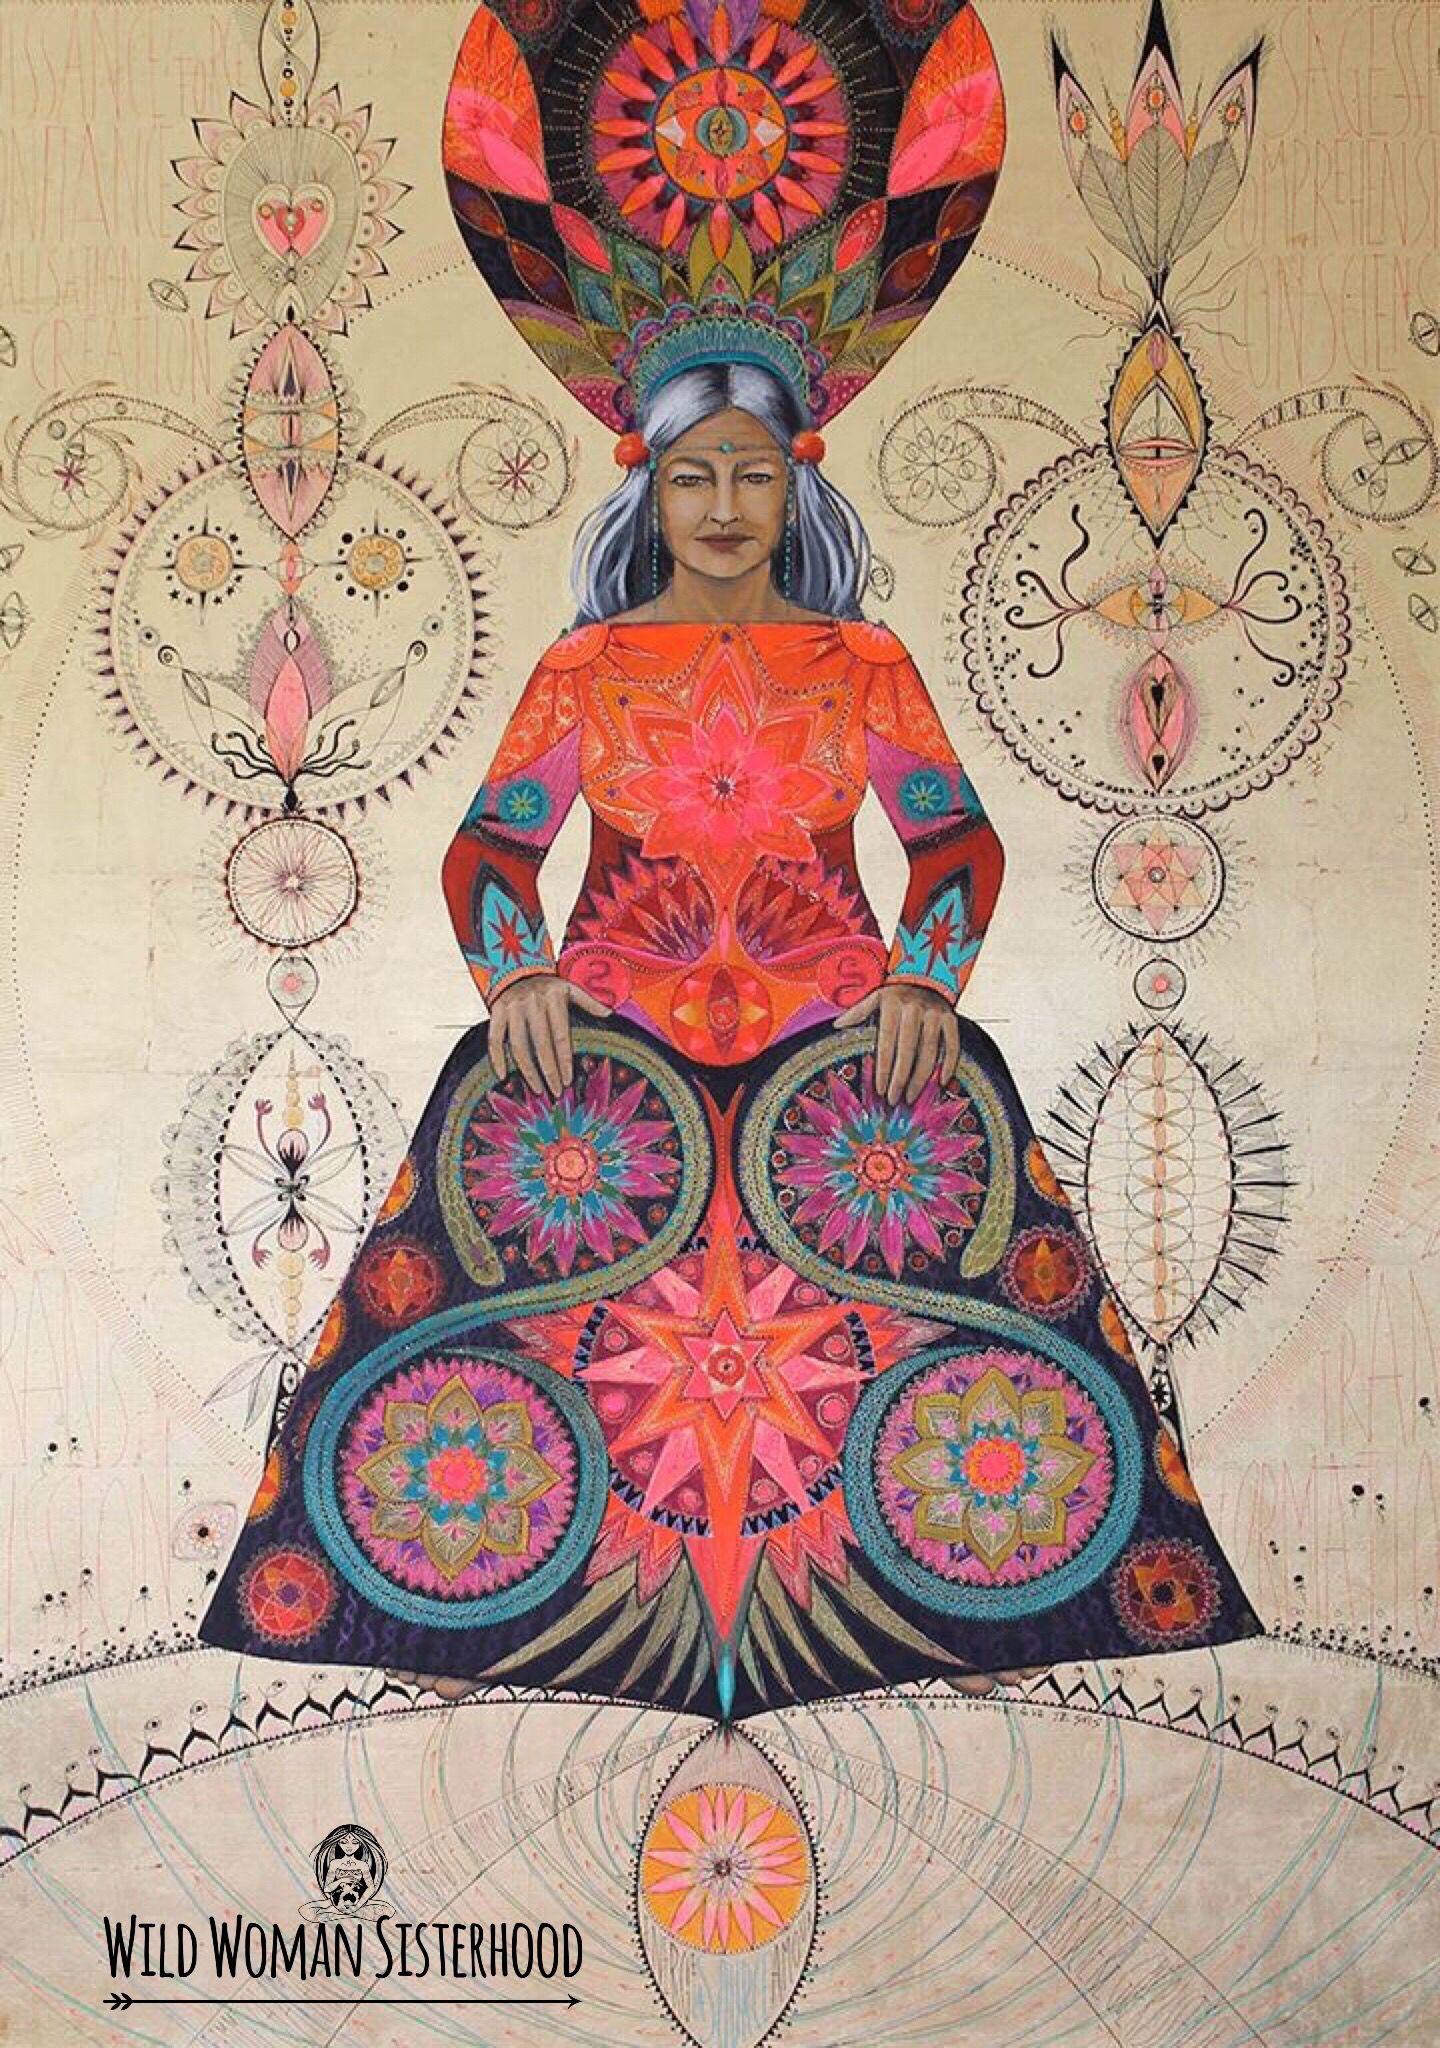 Medicine Woman Tarot By Carol Bridges: A Gypsy 'Drabarni' Is A Shaman, Medicine Woman Shape